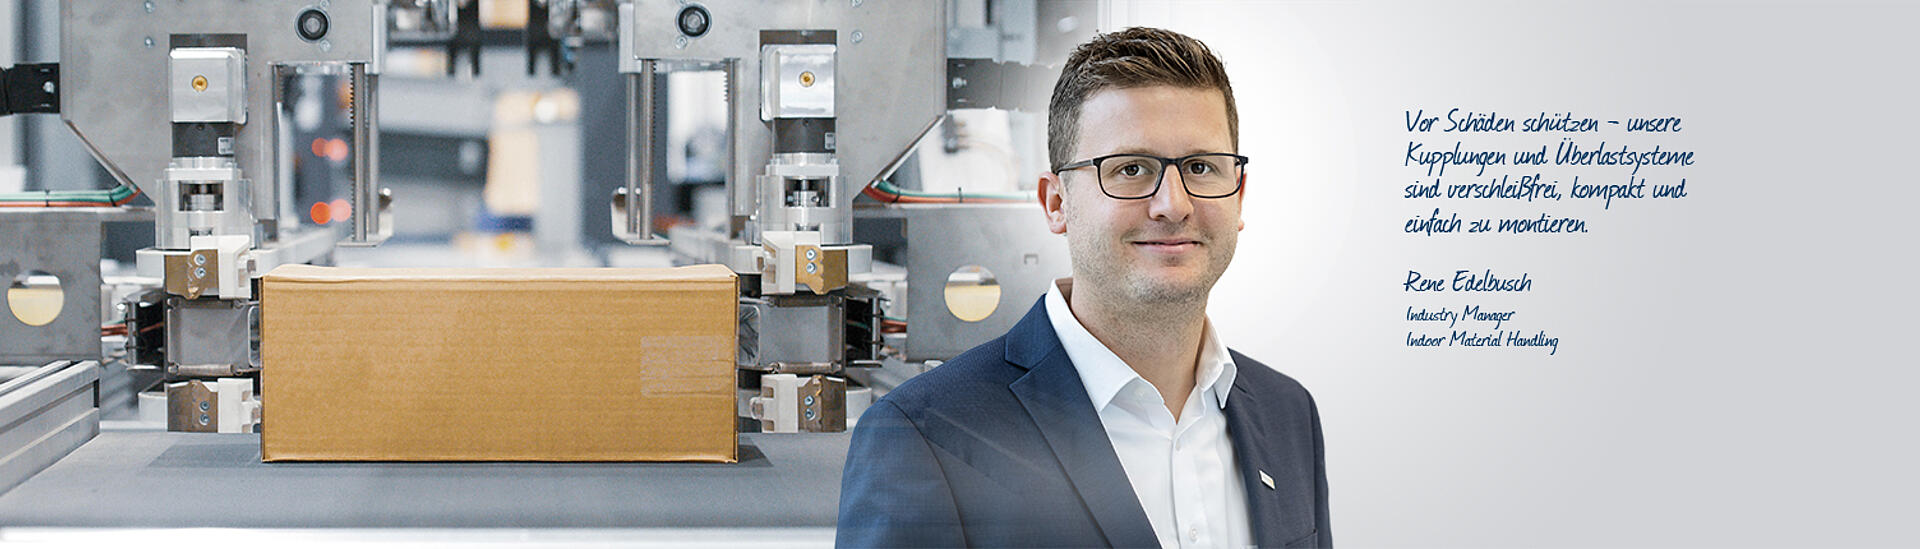 Ansprechpartner Branche In-Hausfördertechnik - KTR Systems GmbH